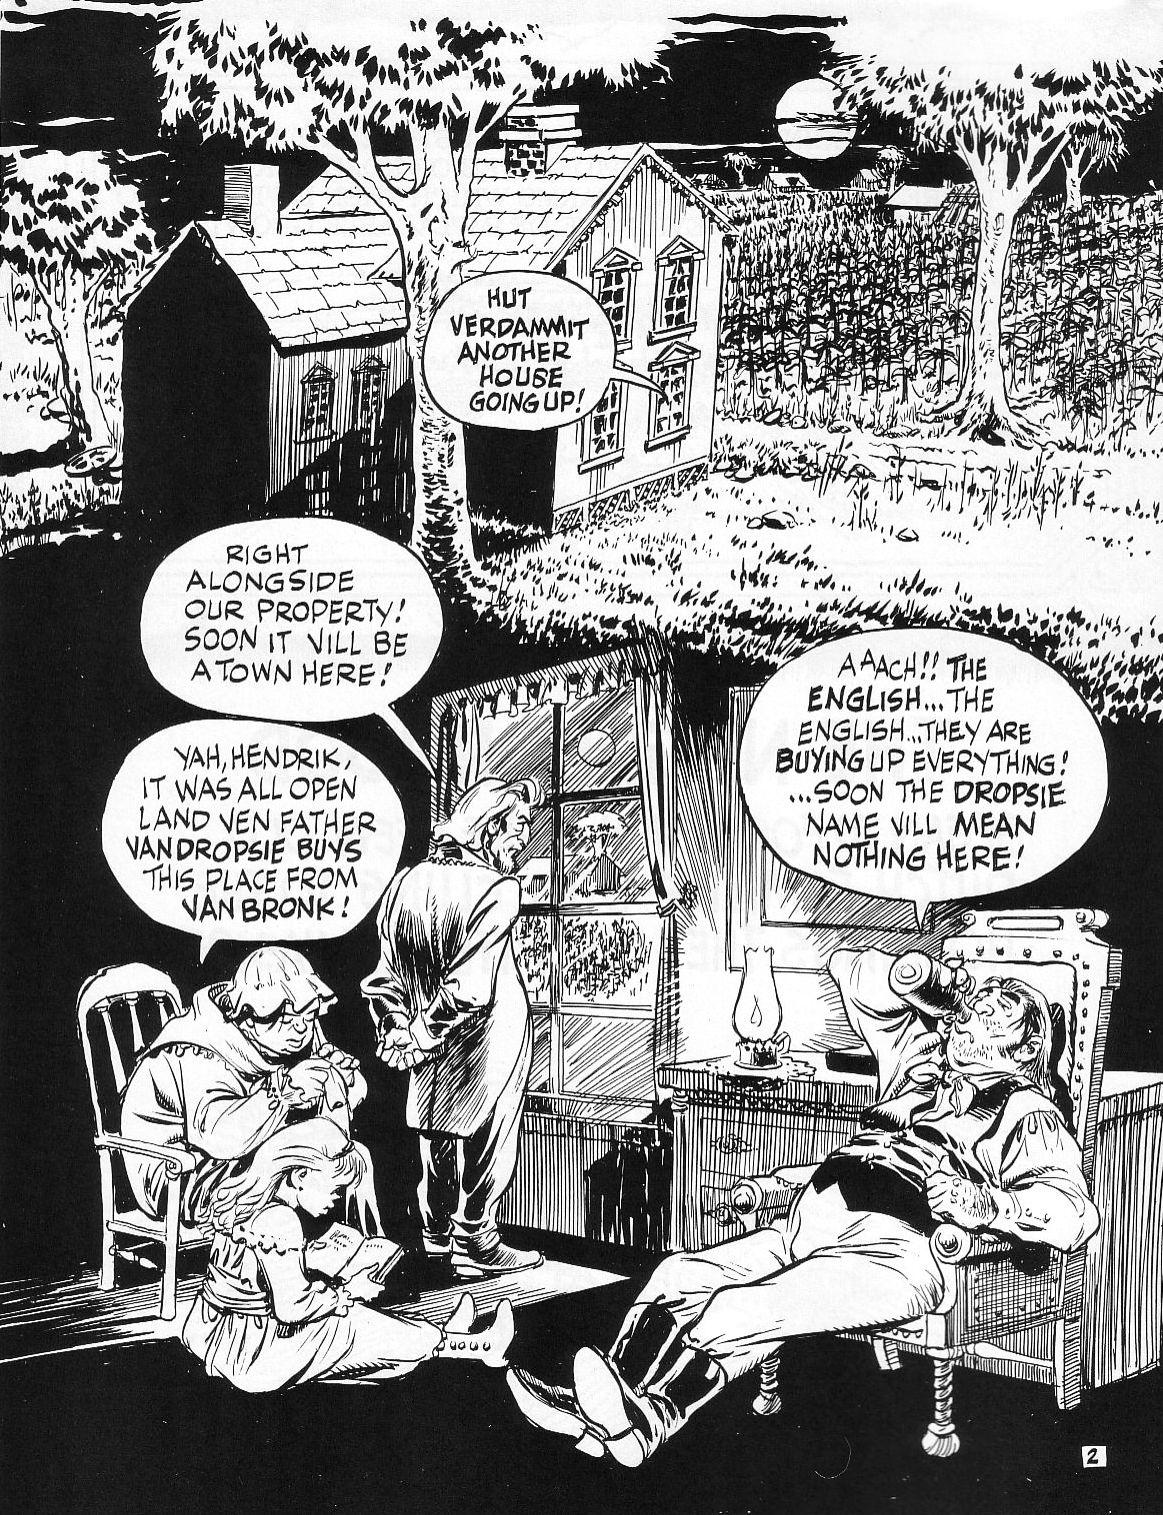 Read online Dropsie Avenue, The Neighborhood comic -  Issue # Full - 4